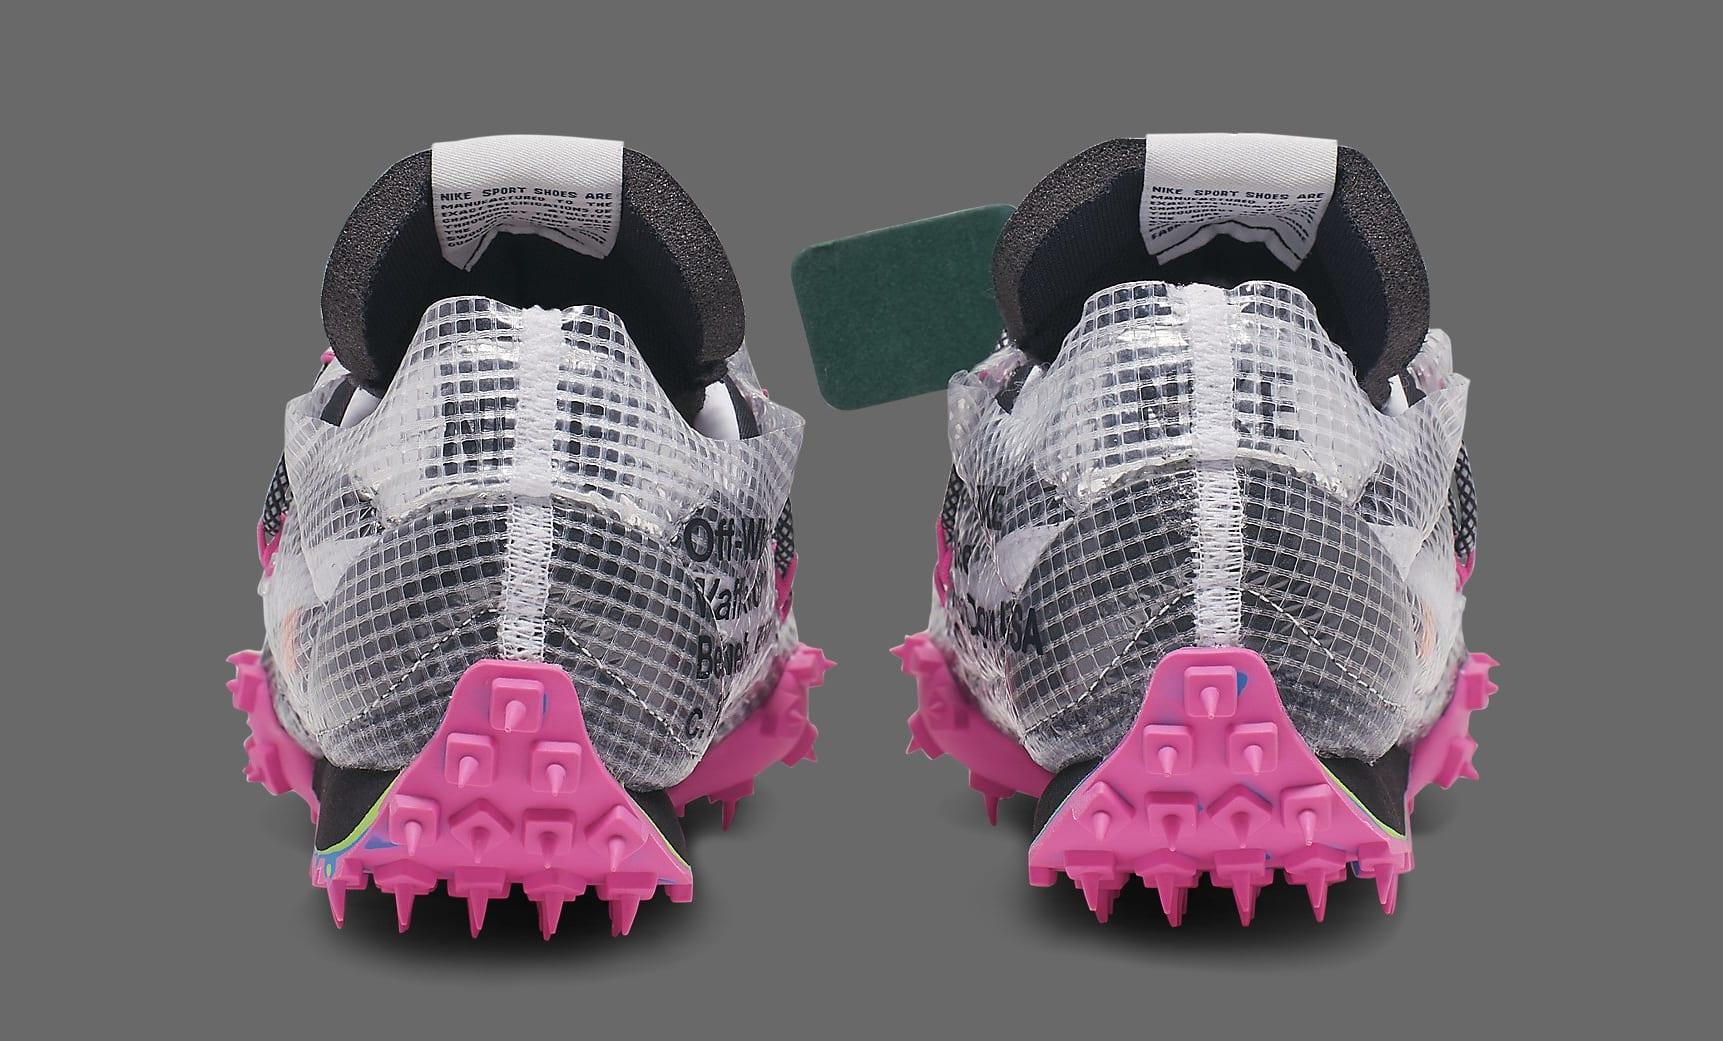 off-white-nike-waffle-racer-womens-fuchsia-cd8180-001-heel